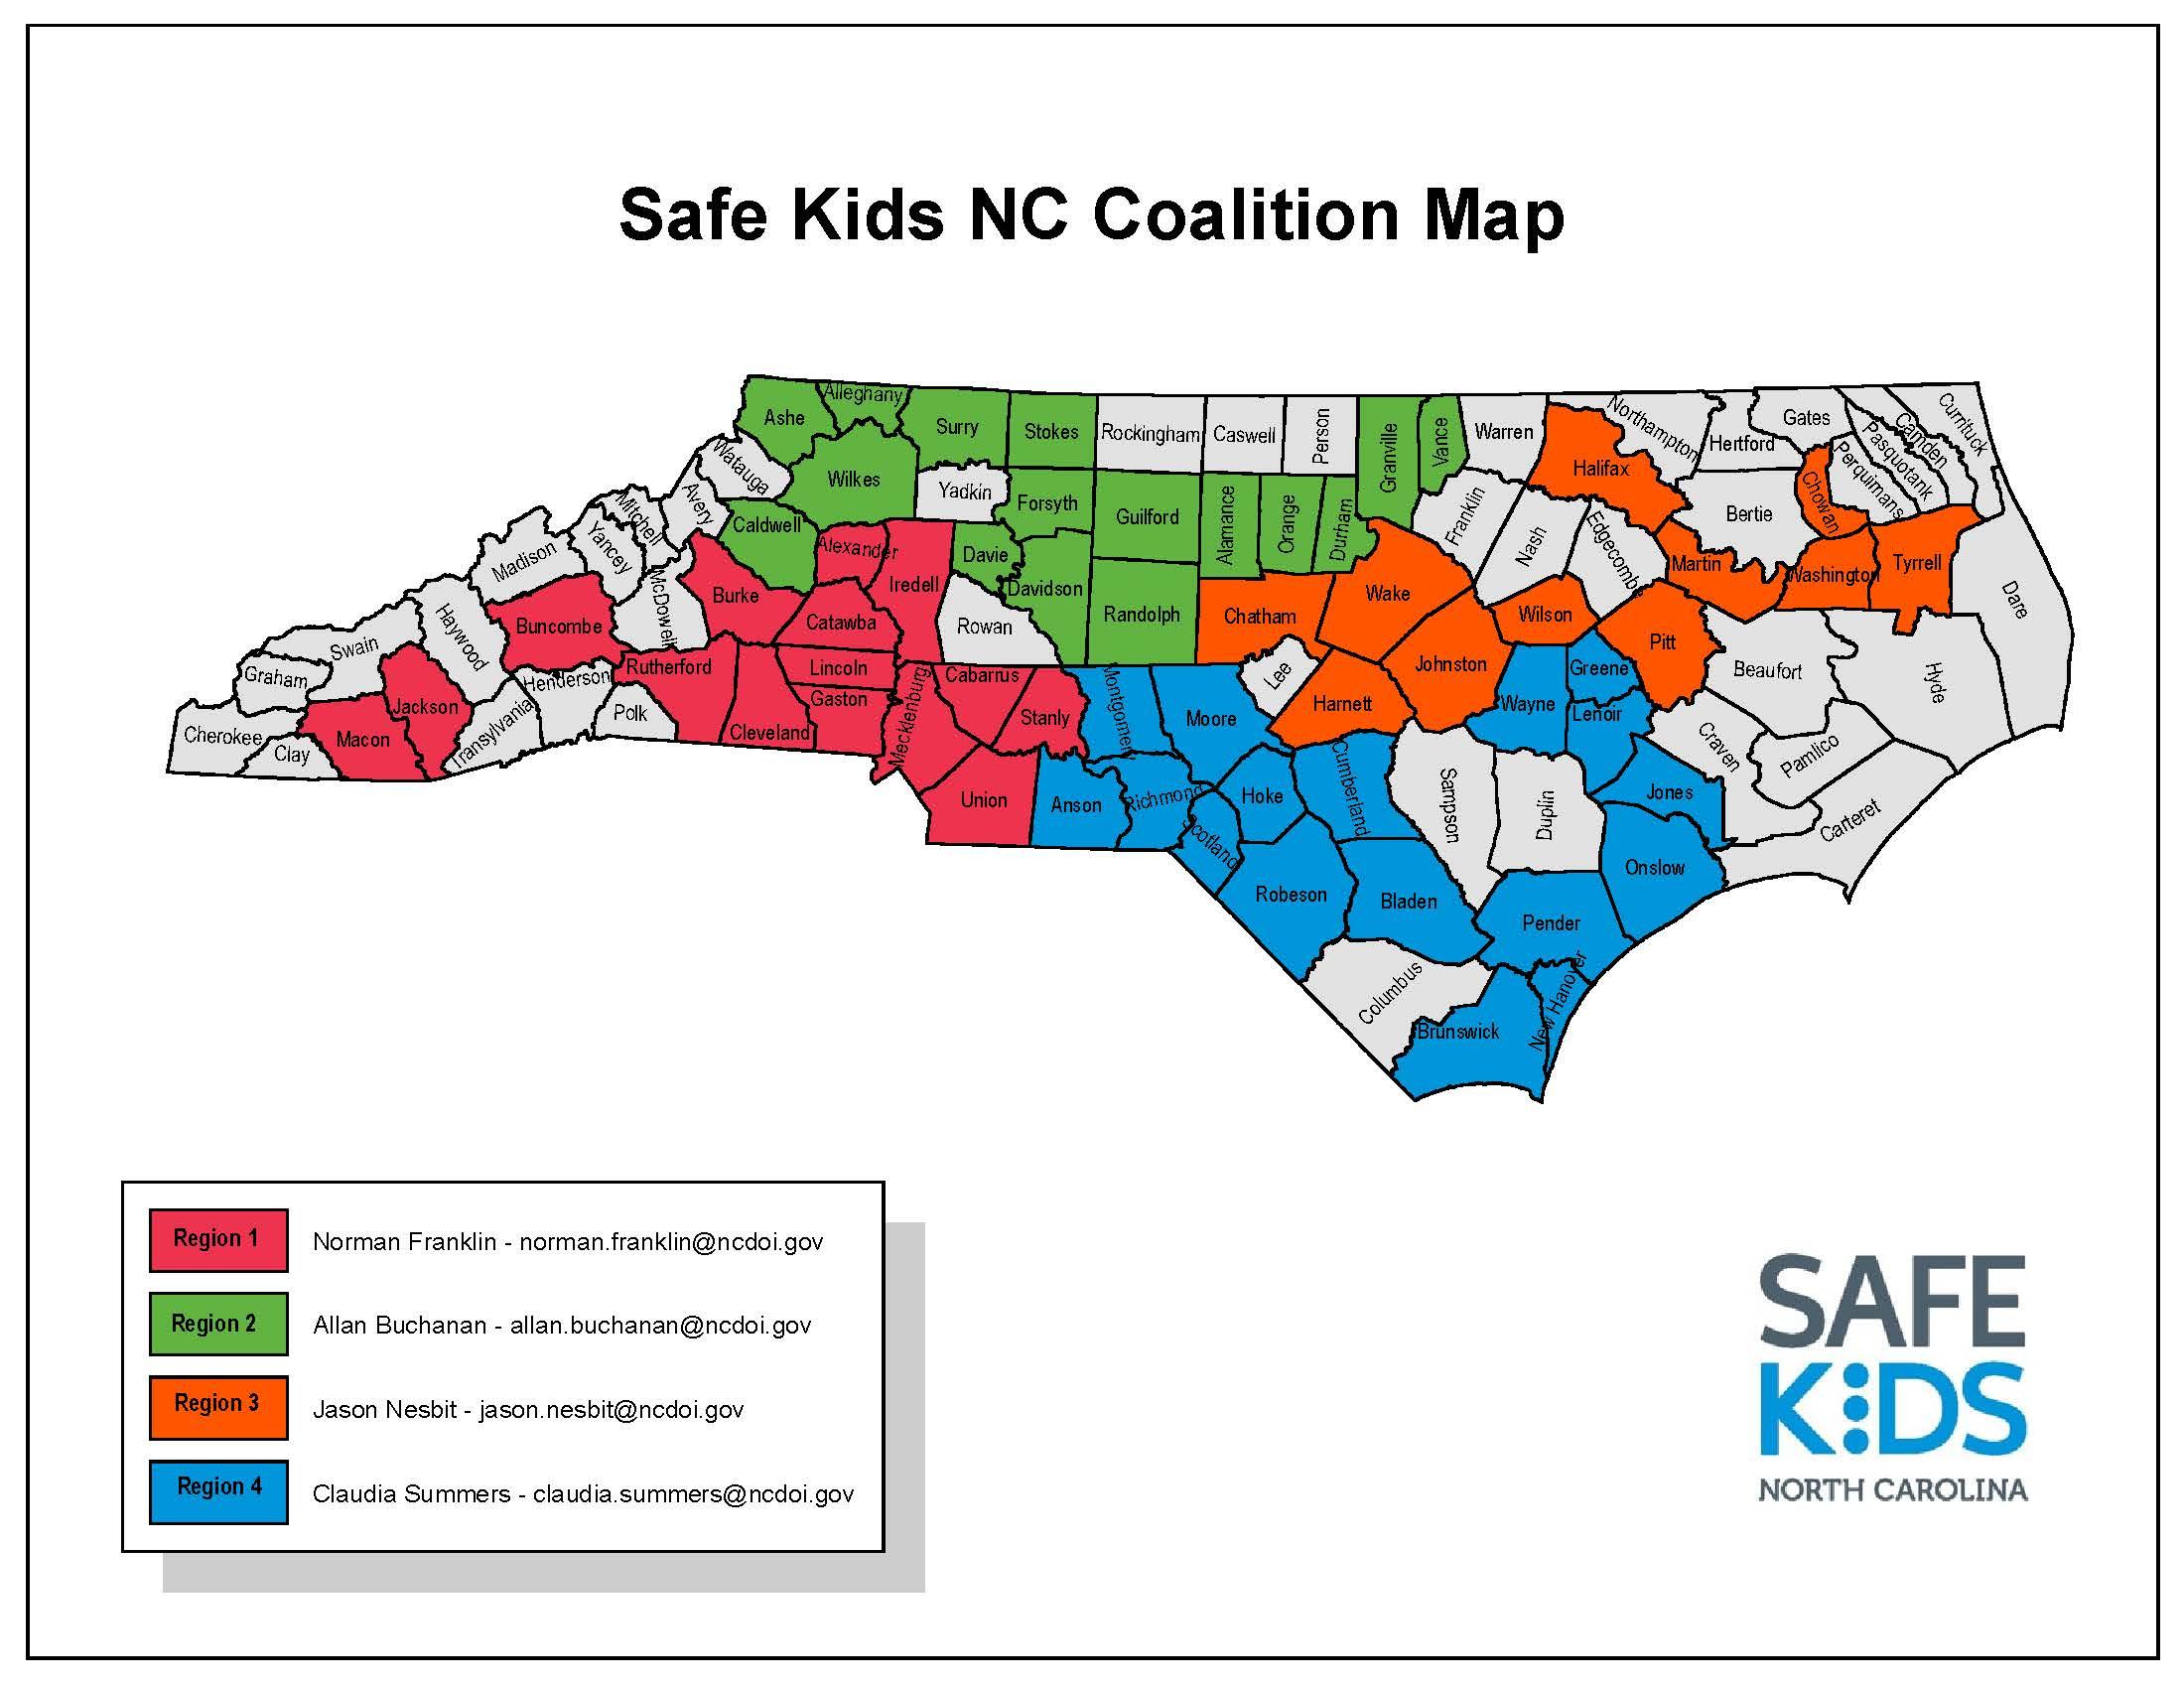 Safe Kids NC Coalition Map